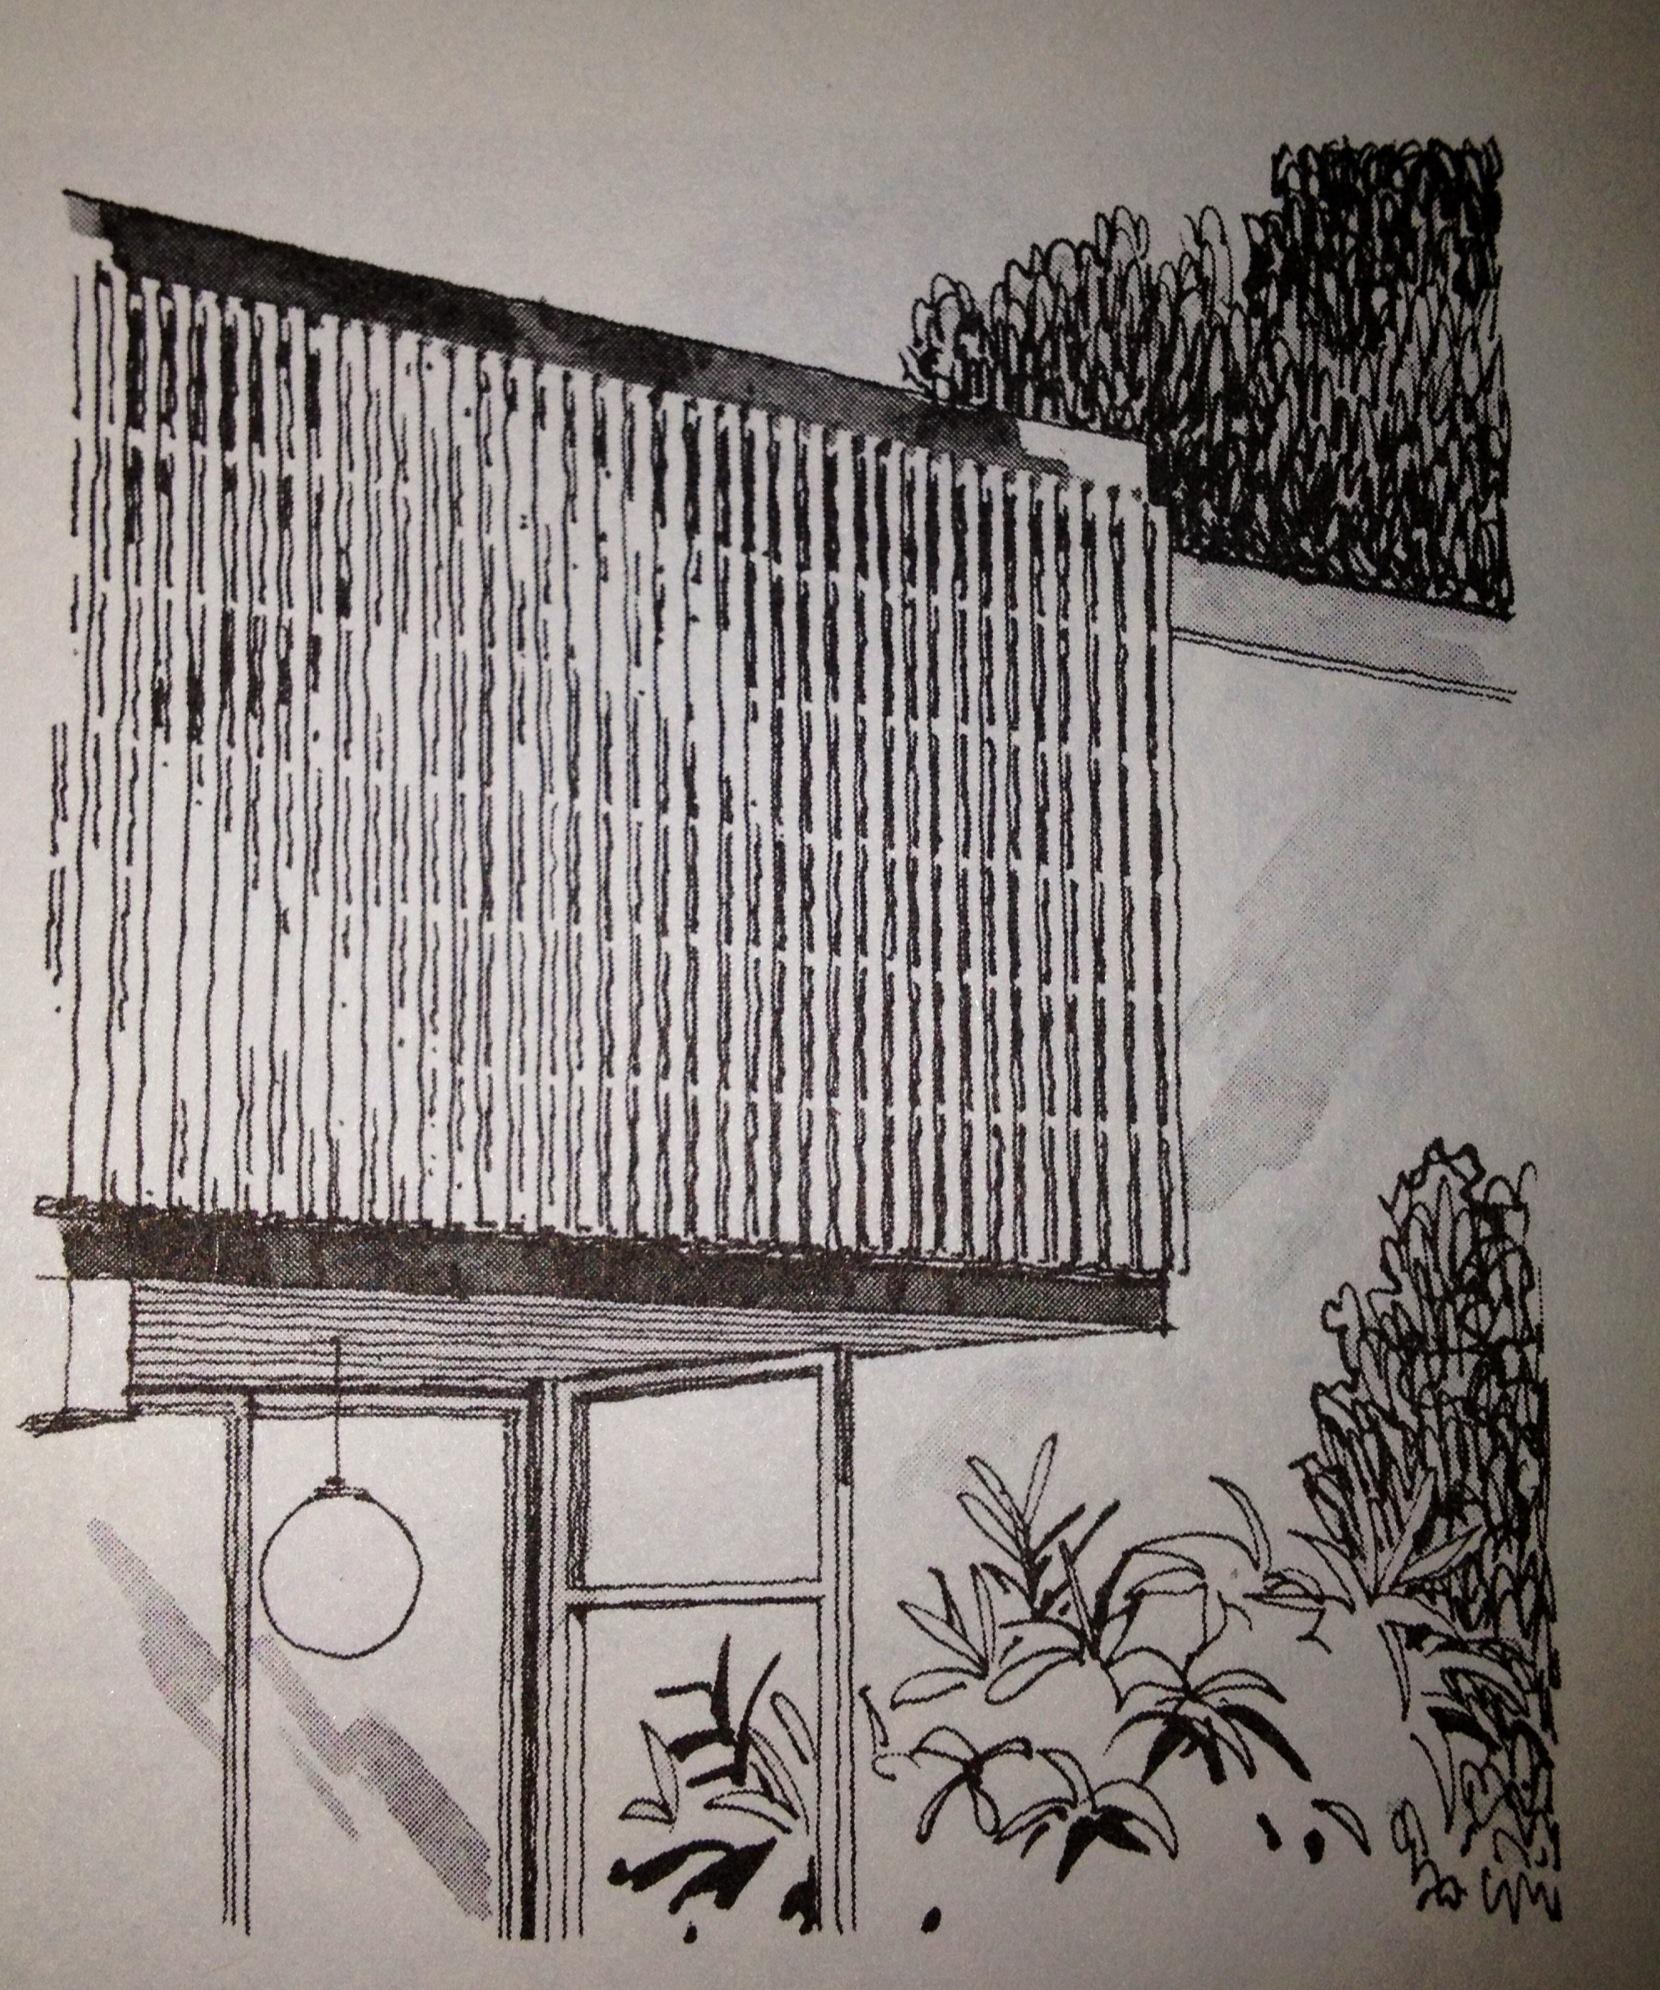 ArchitecturalVignettes